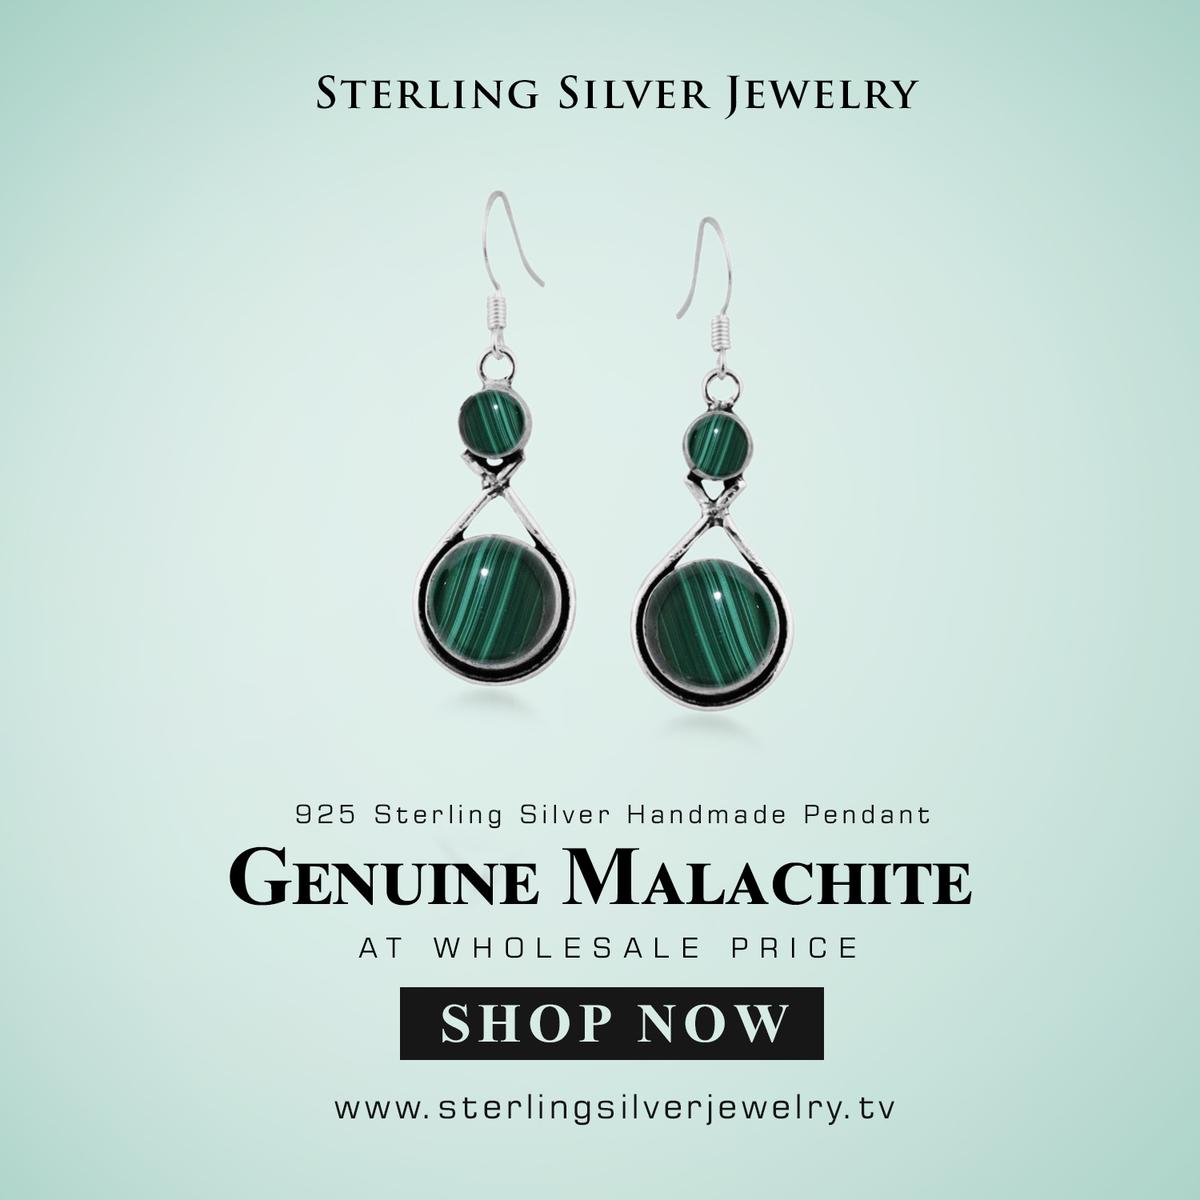 f:id:sterlingsilverjewelry:20190814213029j:plain